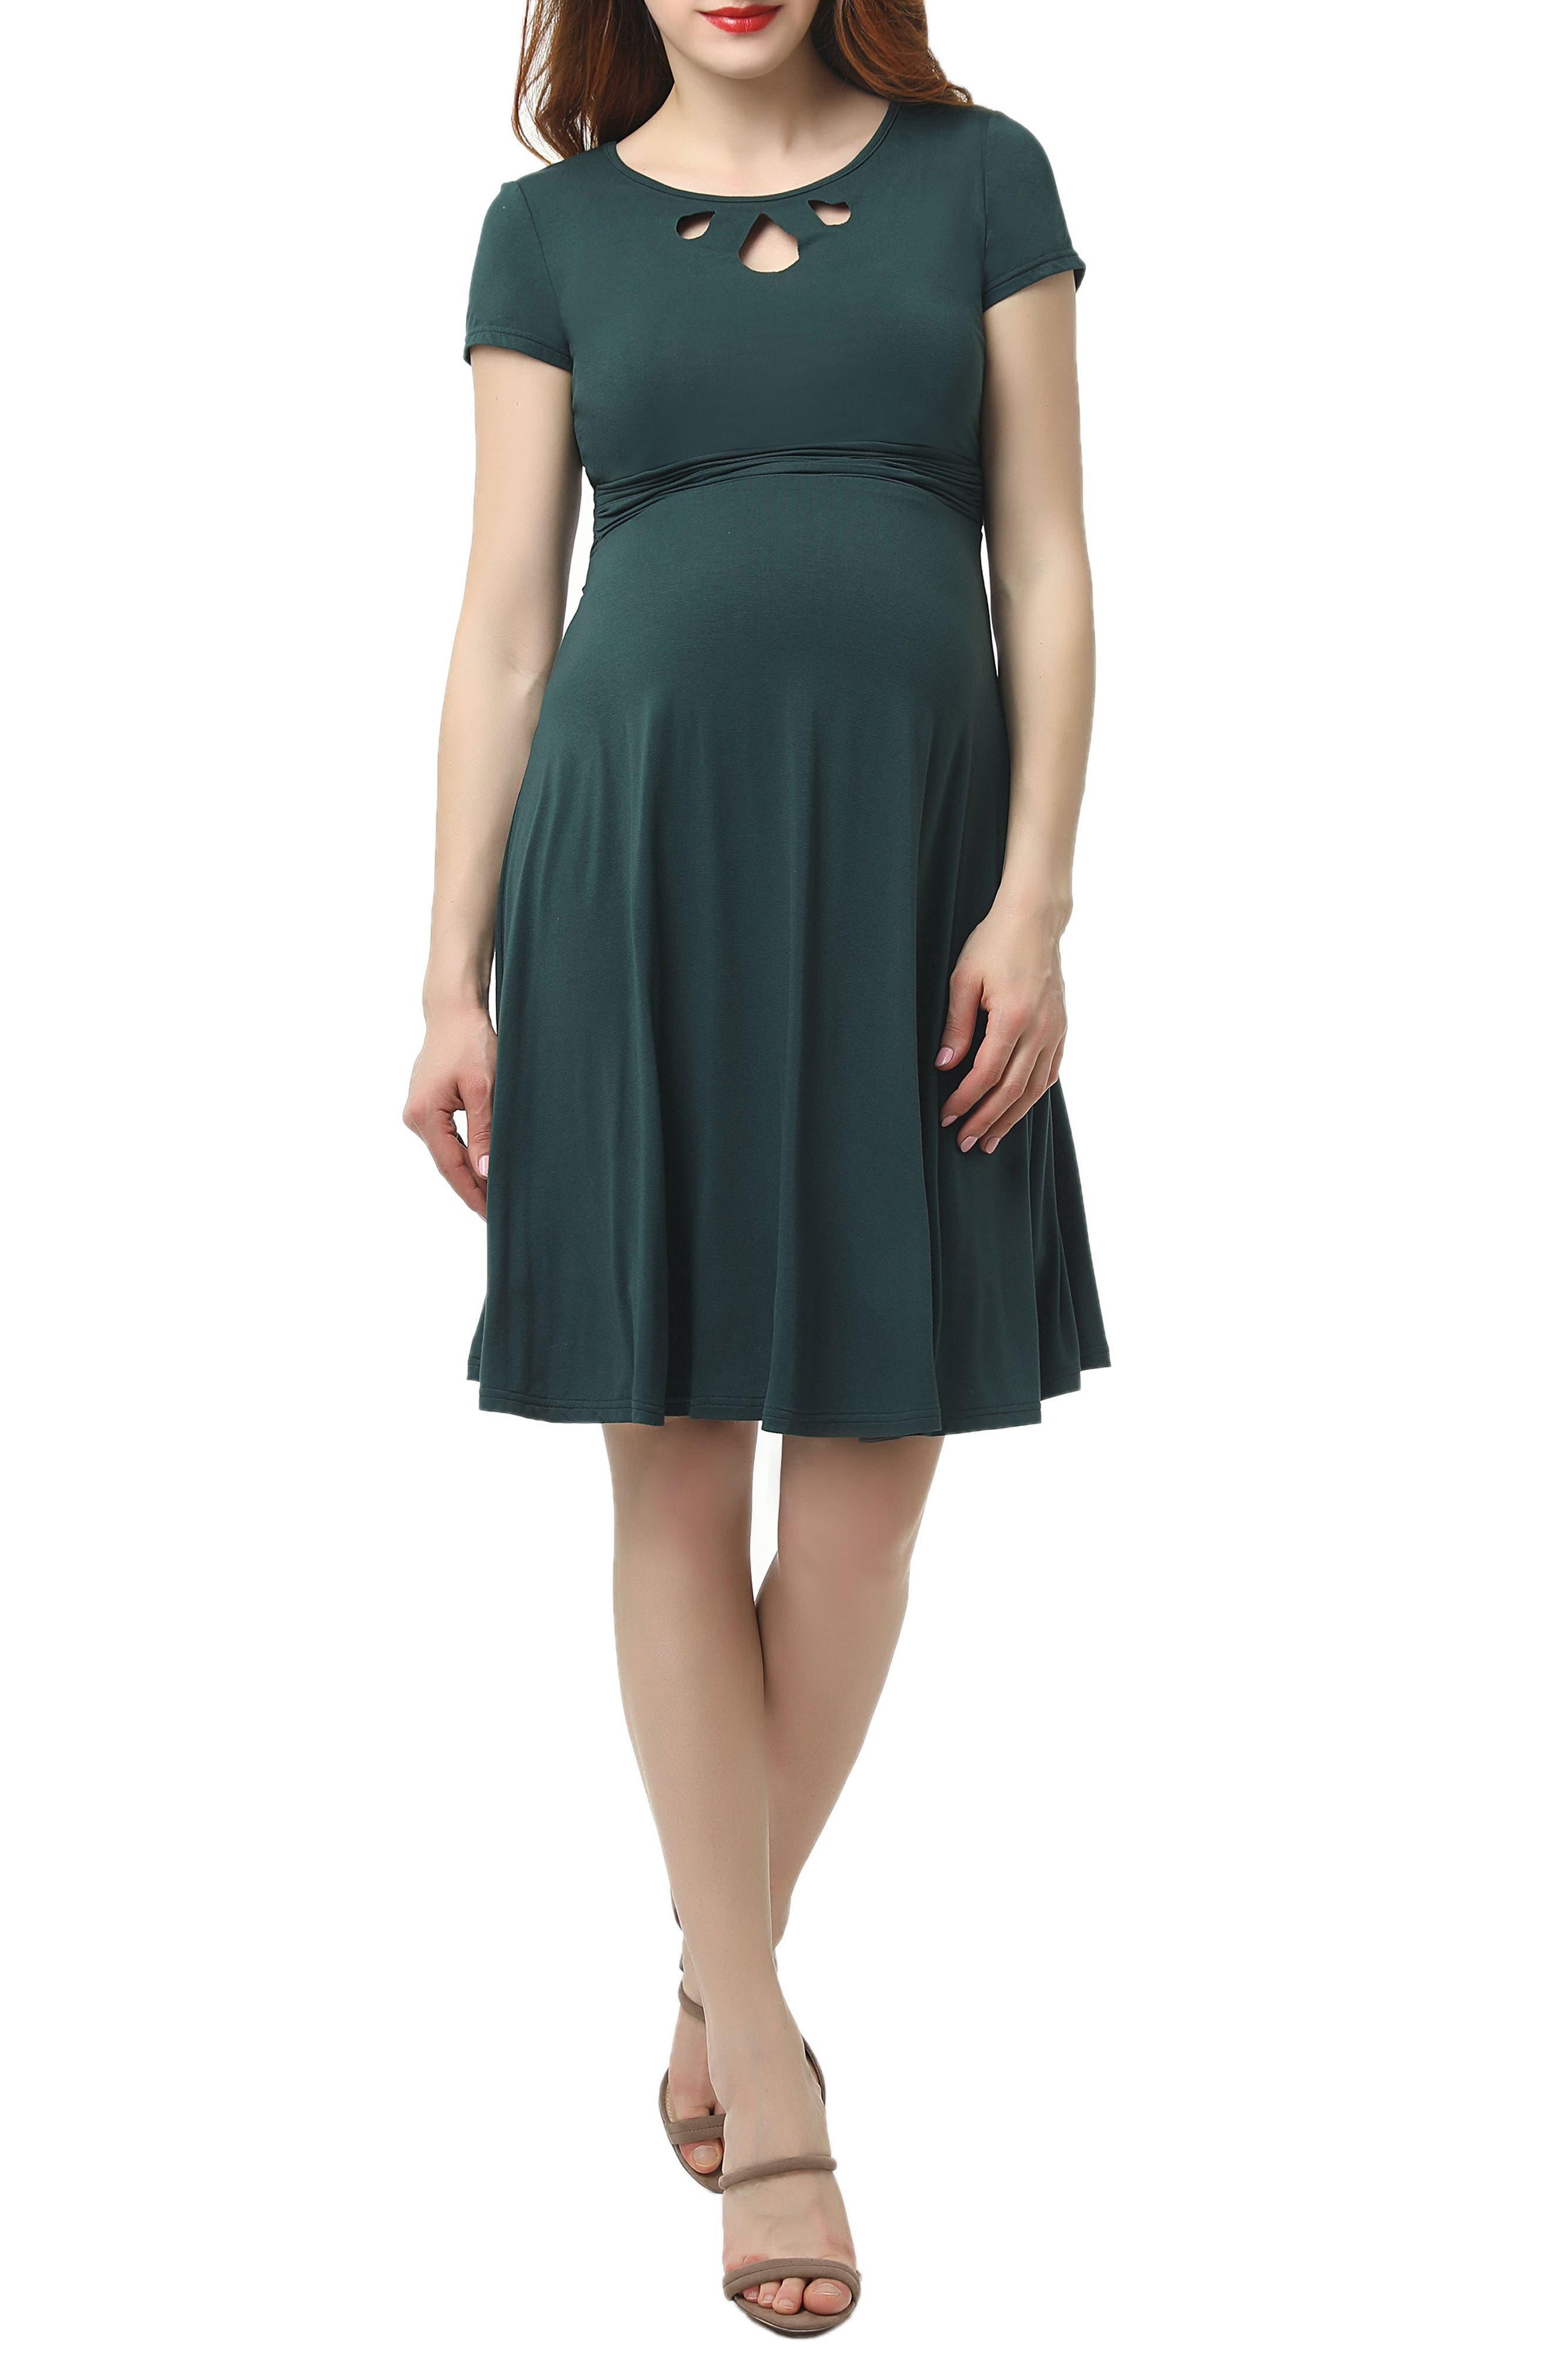 Kimi And Kai Karly Maternity Dress, Green